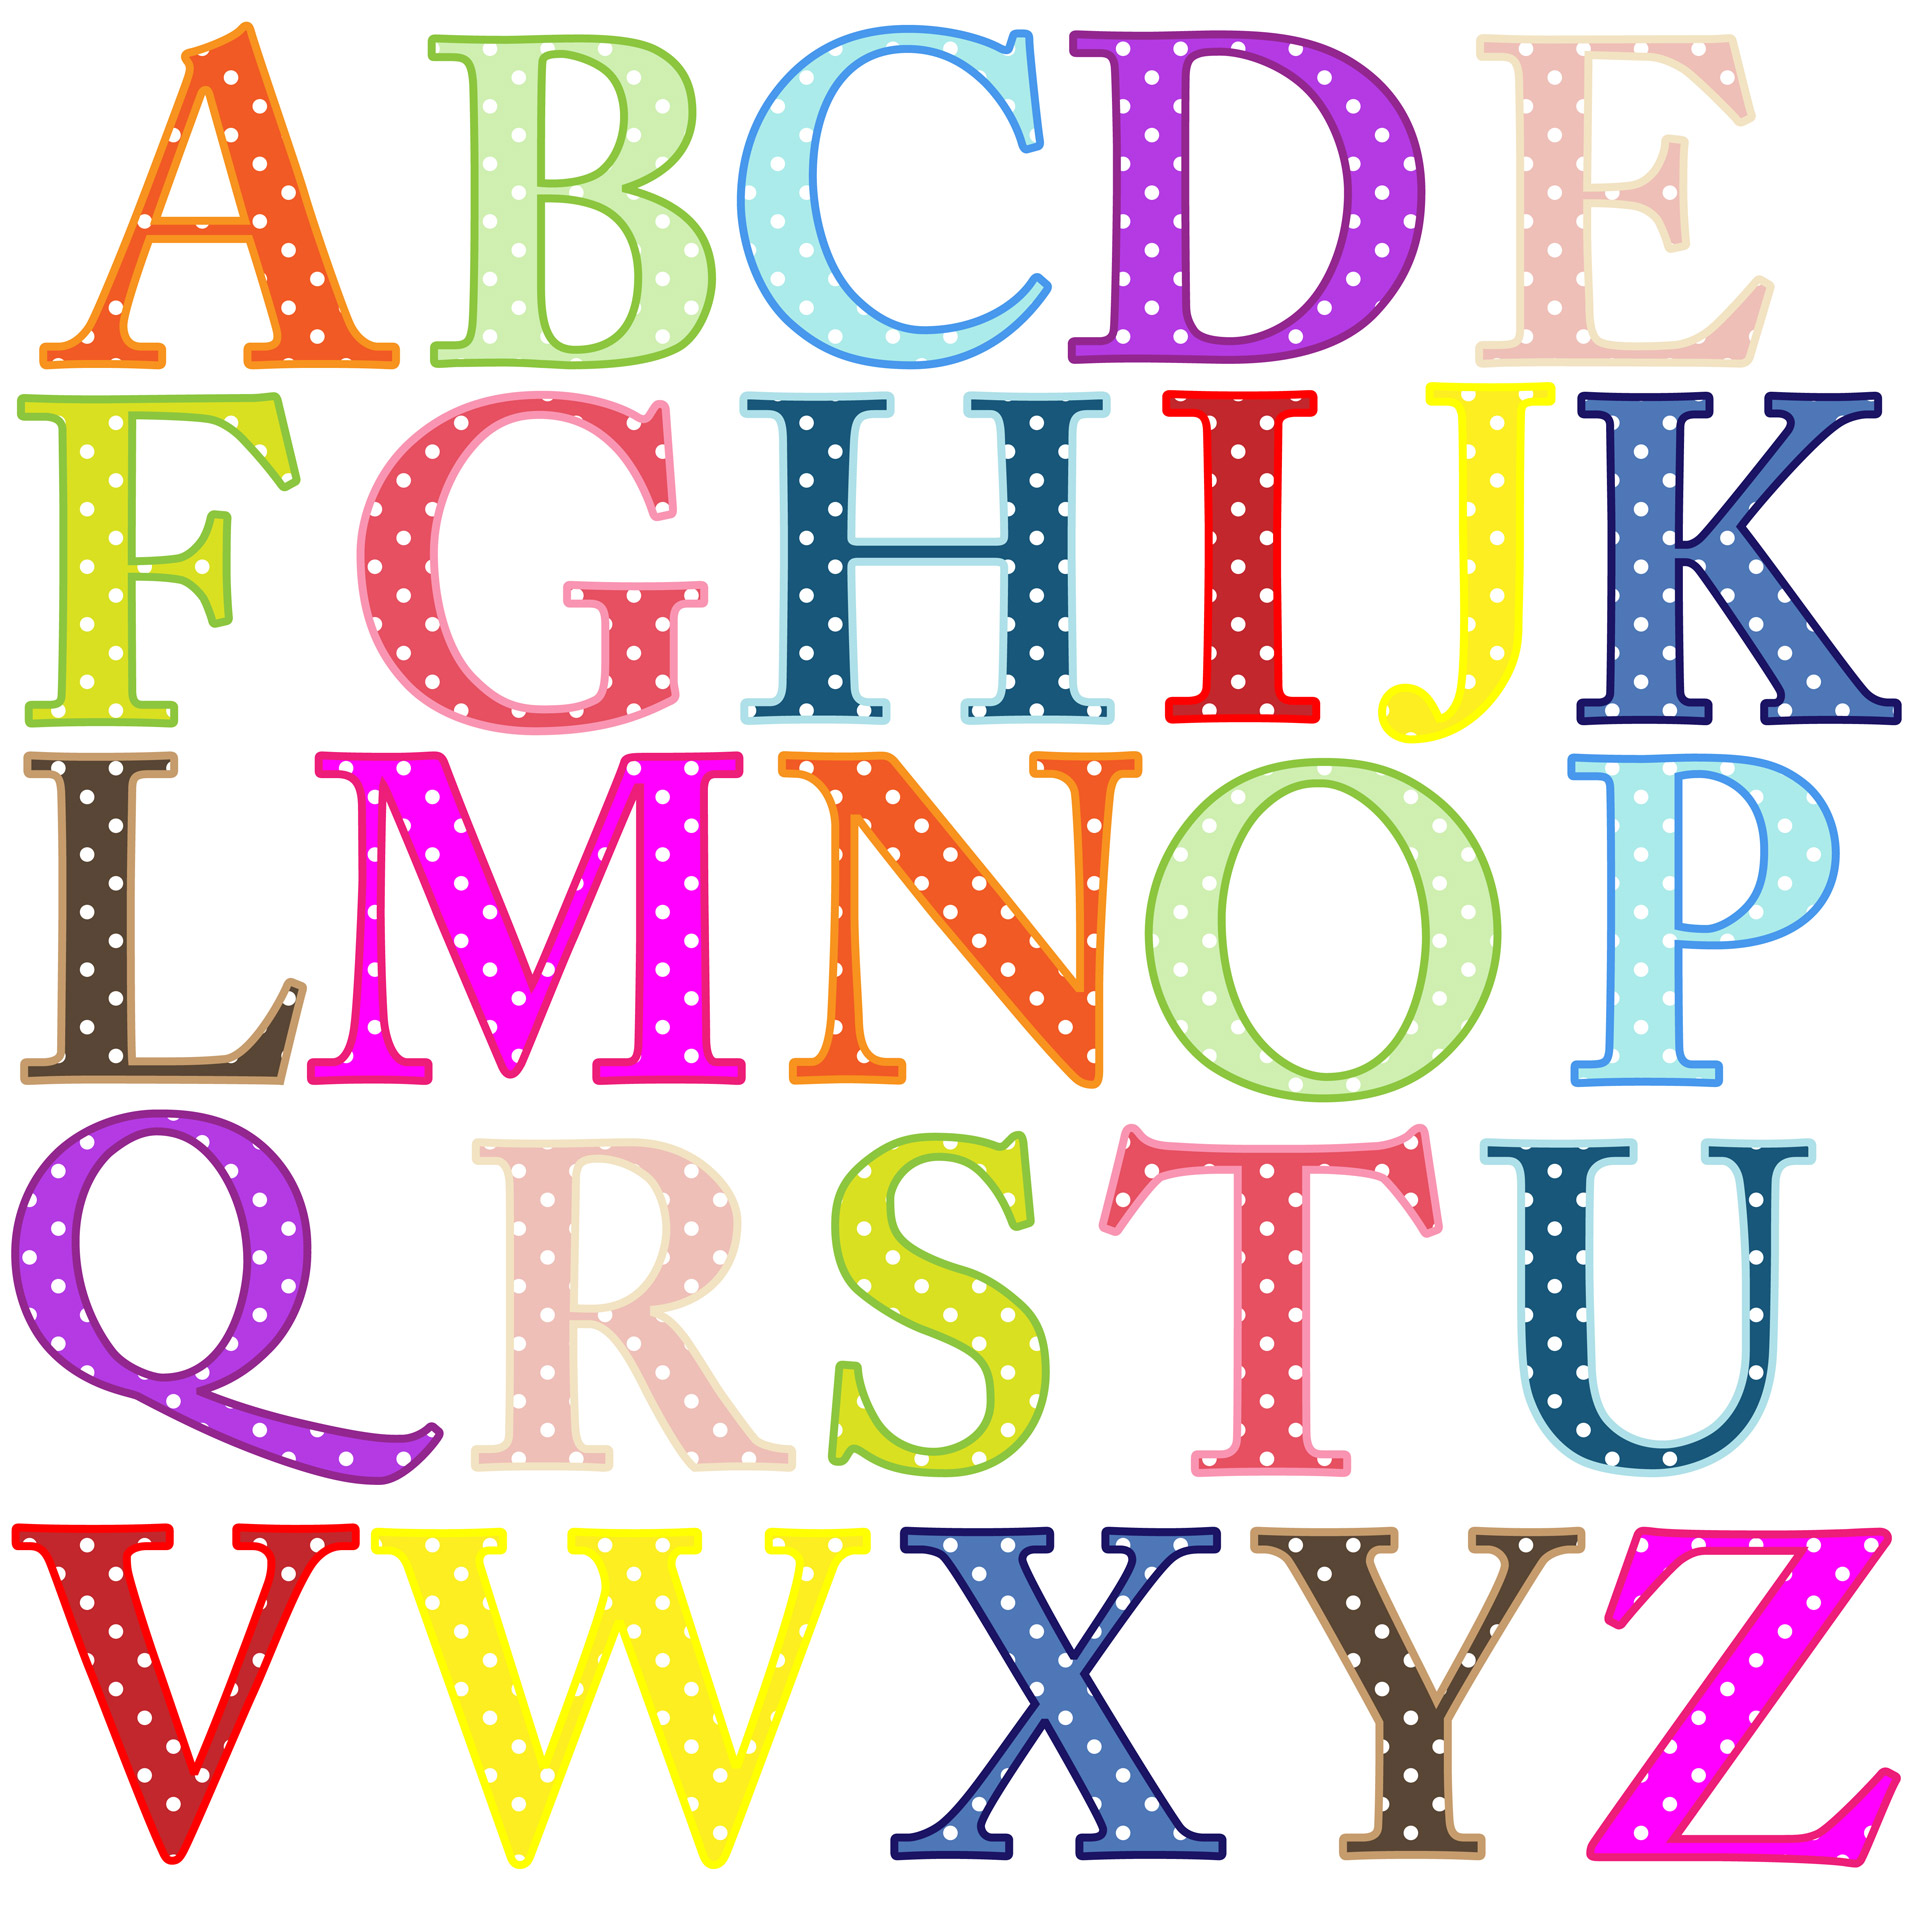 Alphabet letters clip art free stock pho-Alphabet letters clip art free stock photo public domain pictures 3-8